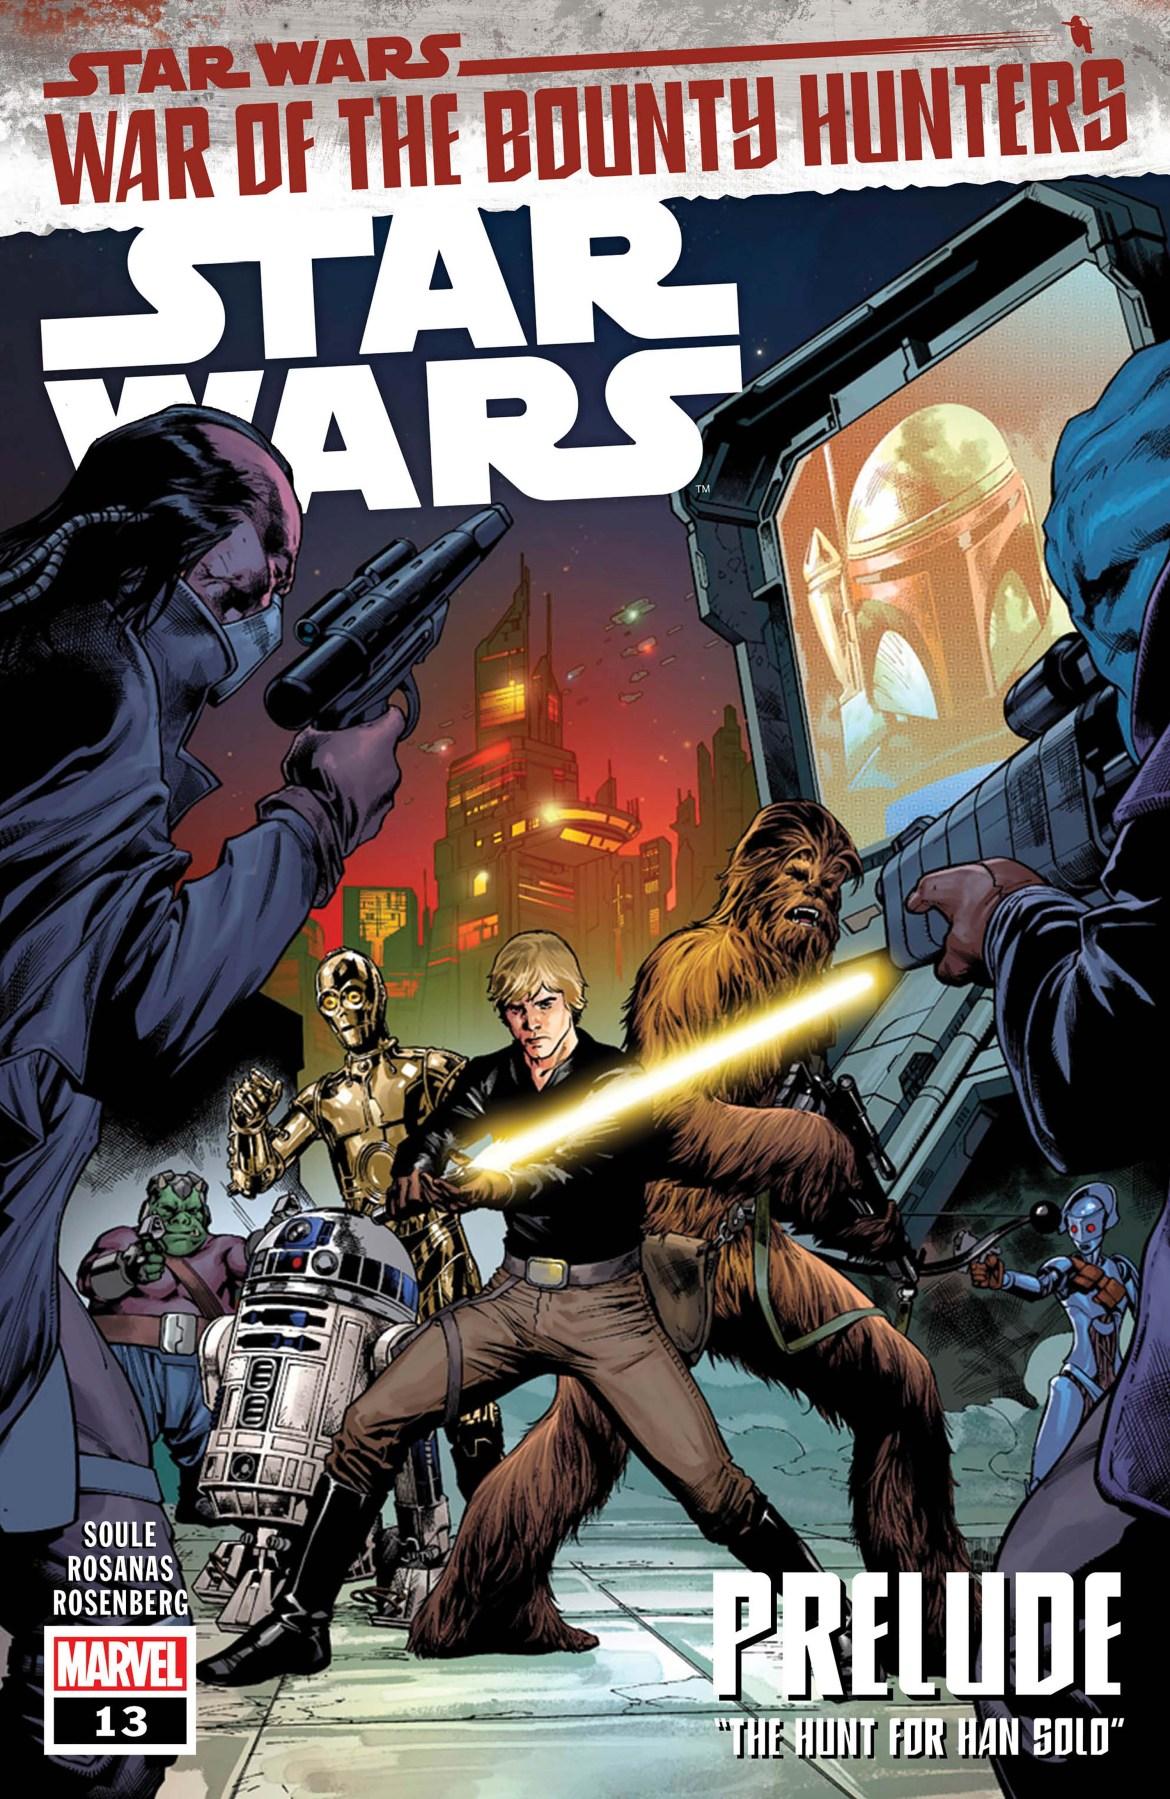 2021_STW-WOTBH_StarWars_13-1 Marvel Comics May 2021 Solicitations